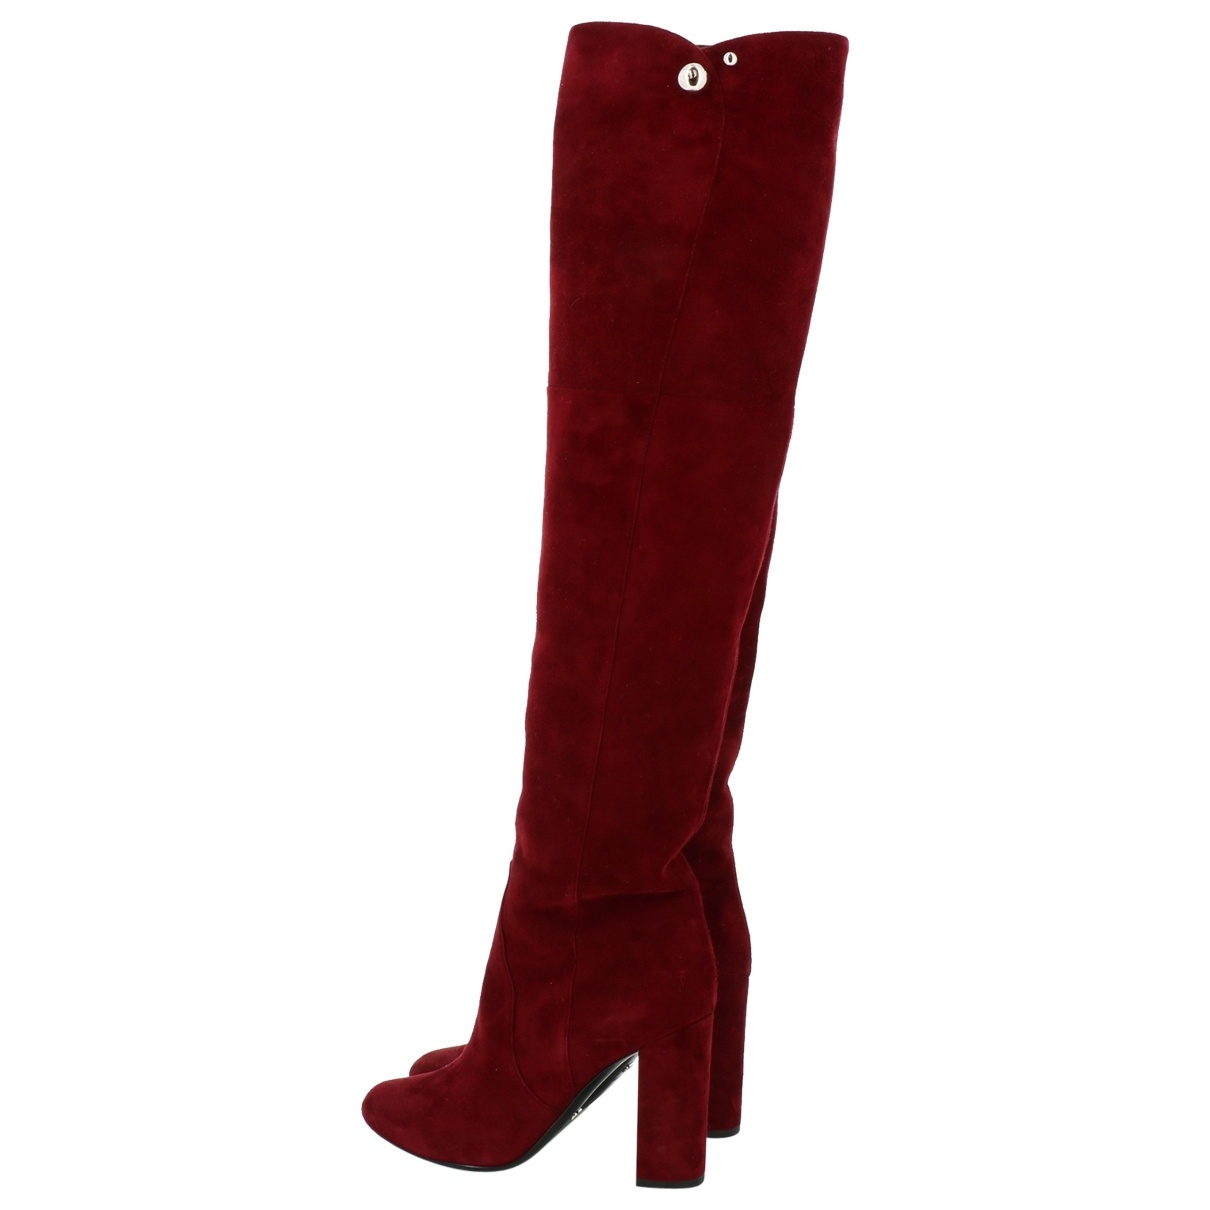 Dior \N Burgundy Suede Boots for Women 37 EU